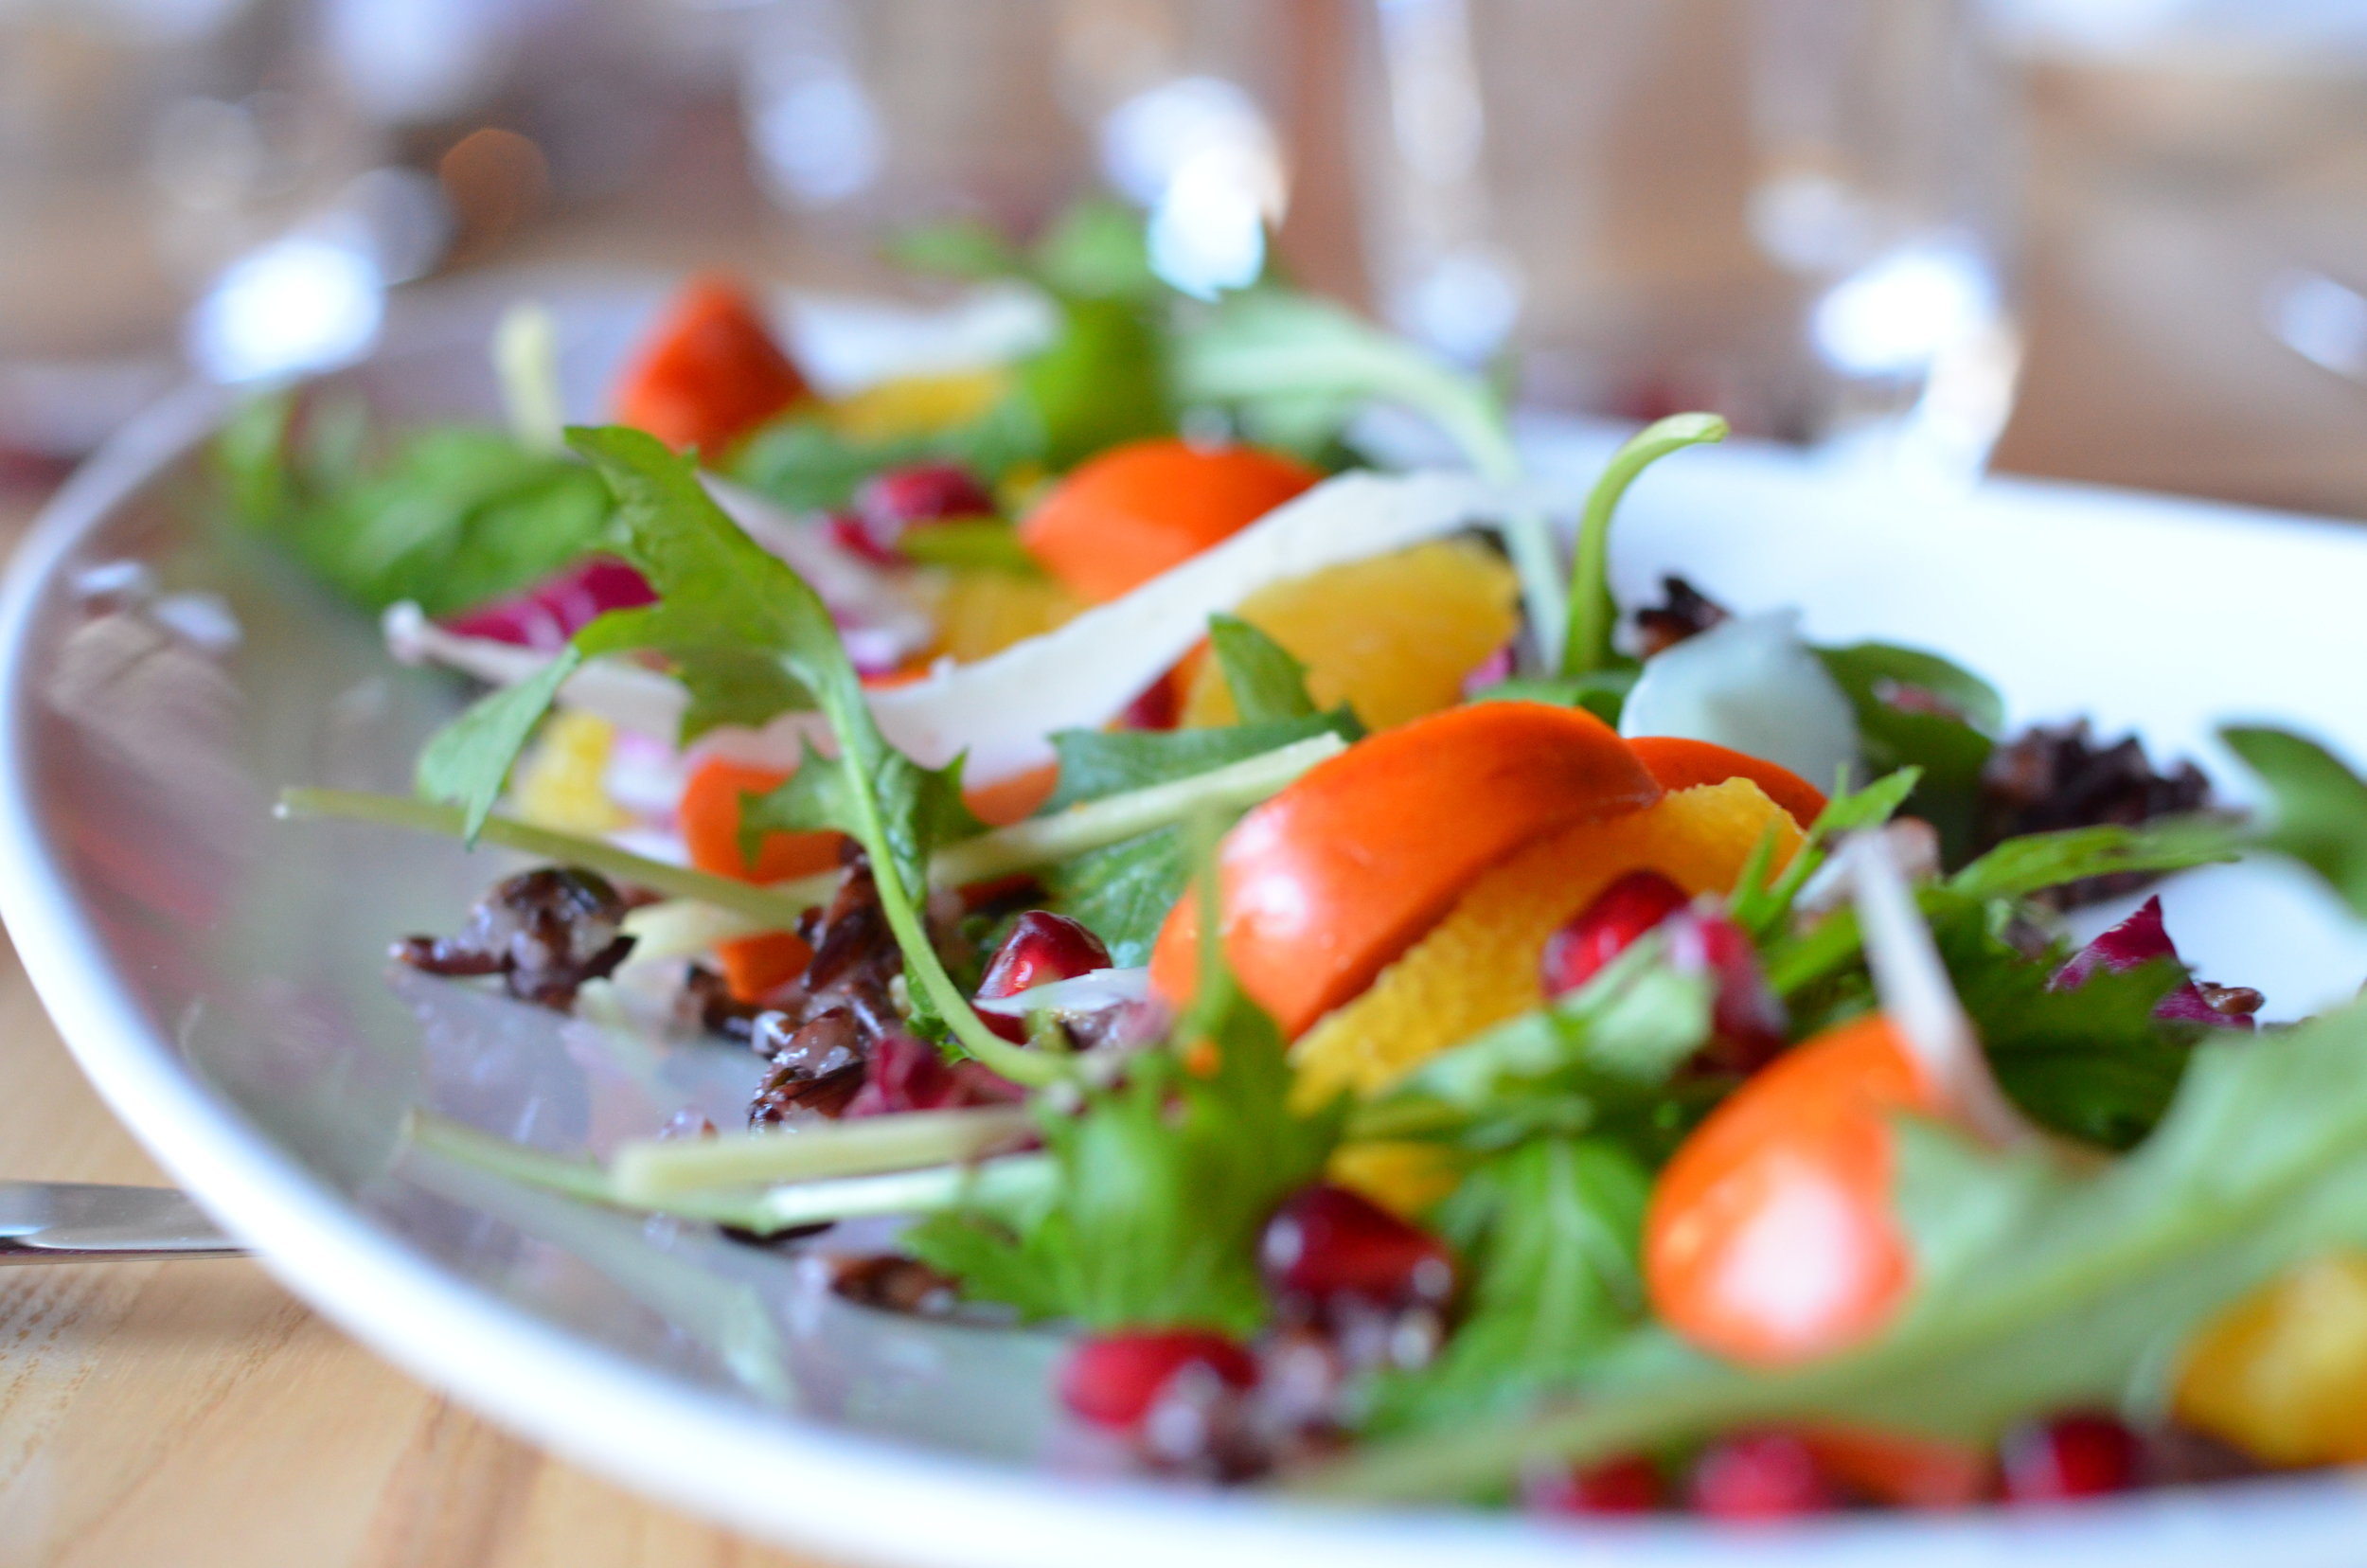 wr salad 2.JPG